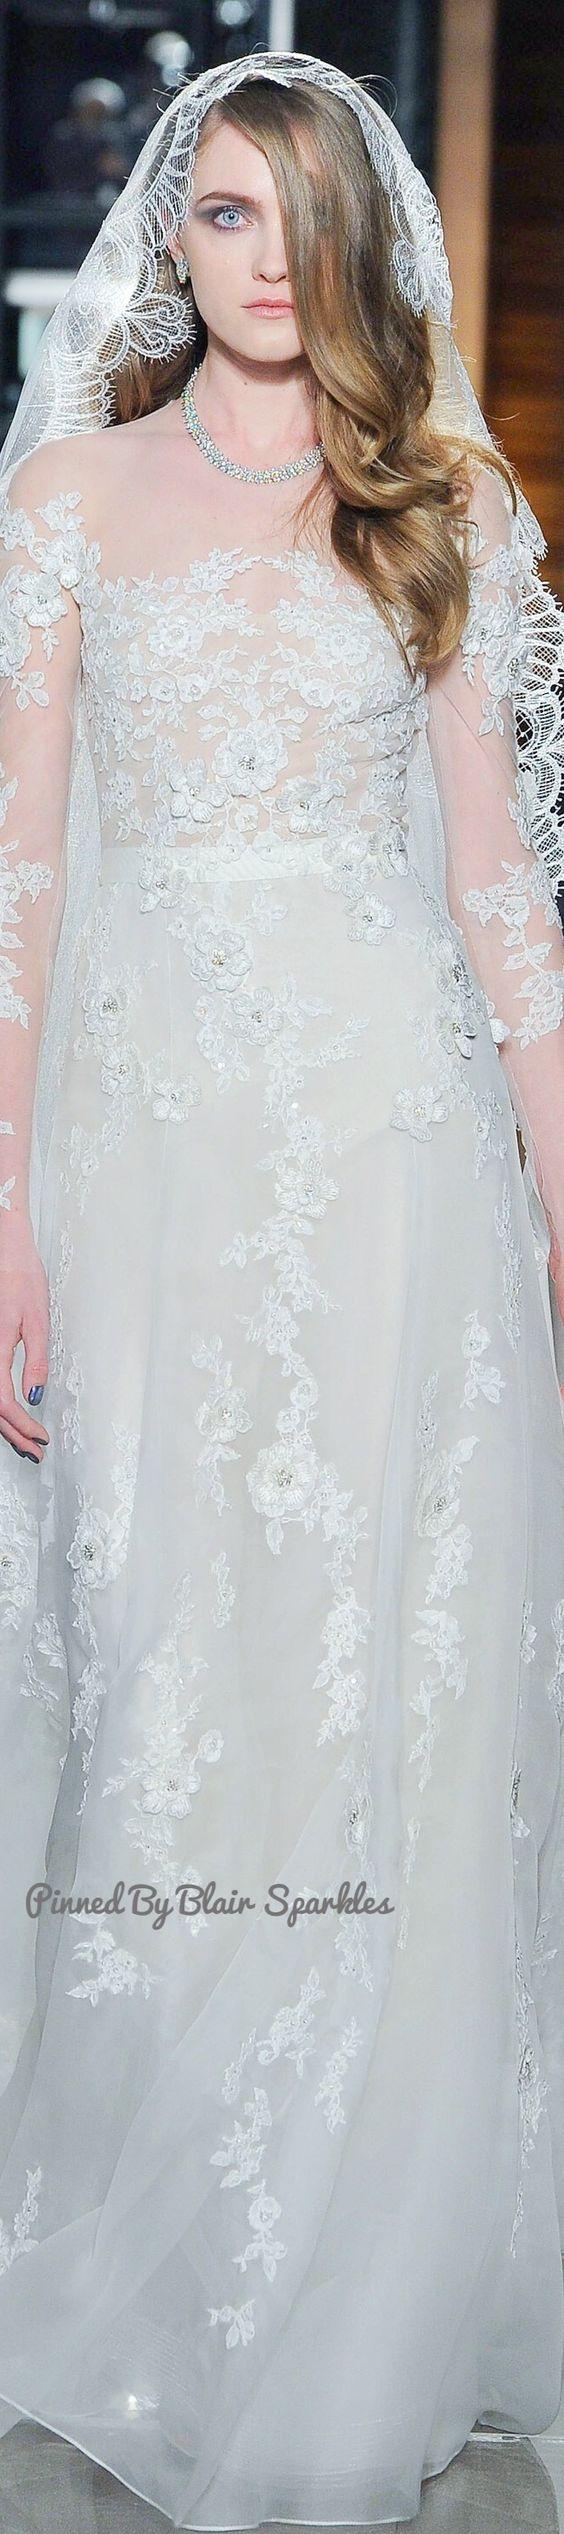 Reem acra bridal spring εїз blair sparkles the gown